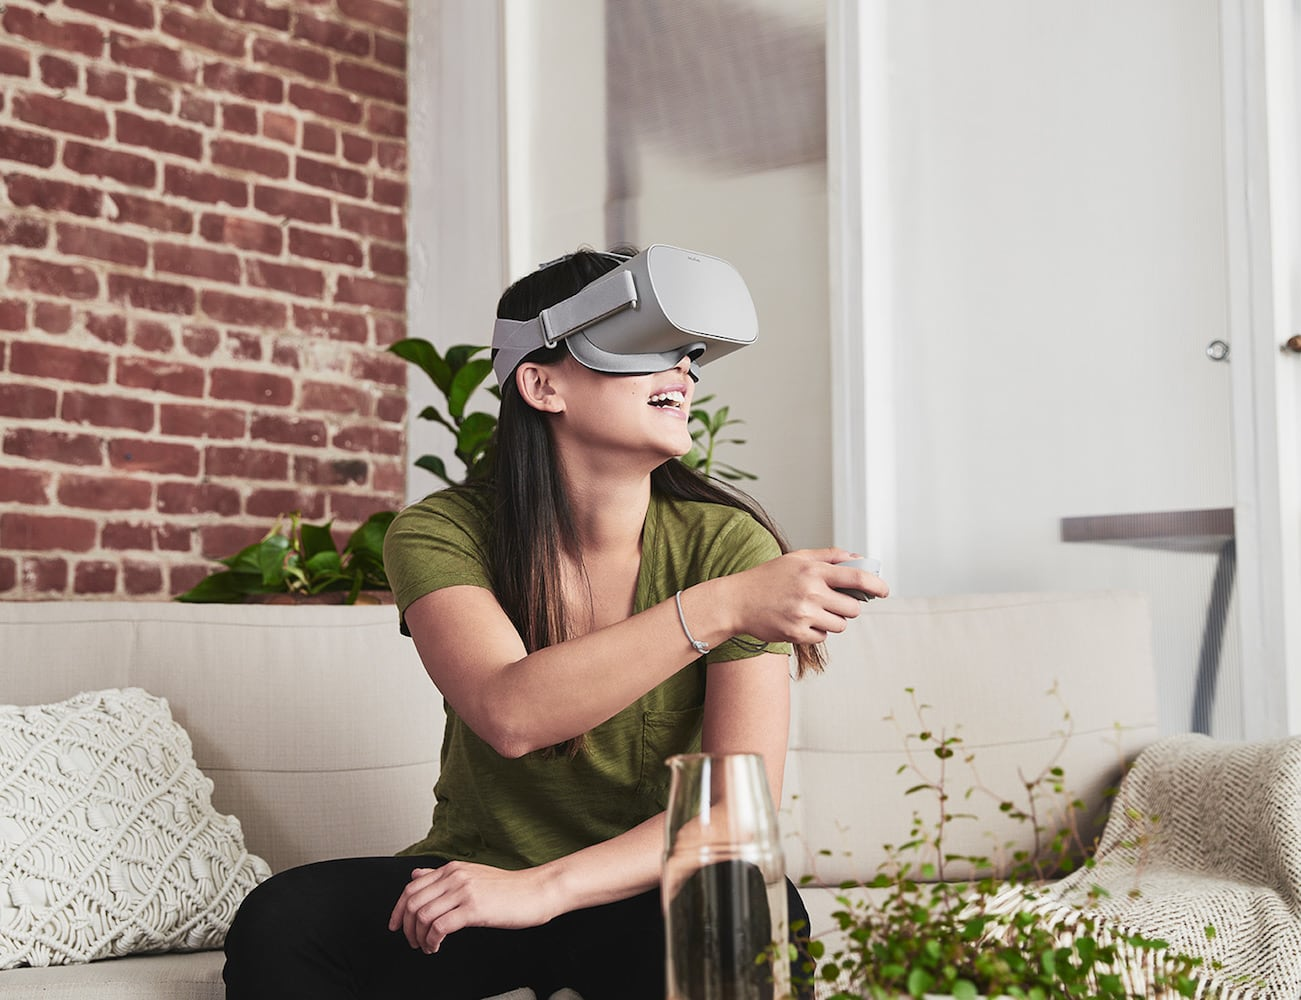 Oculus+Go+Wireless+VR+Headset